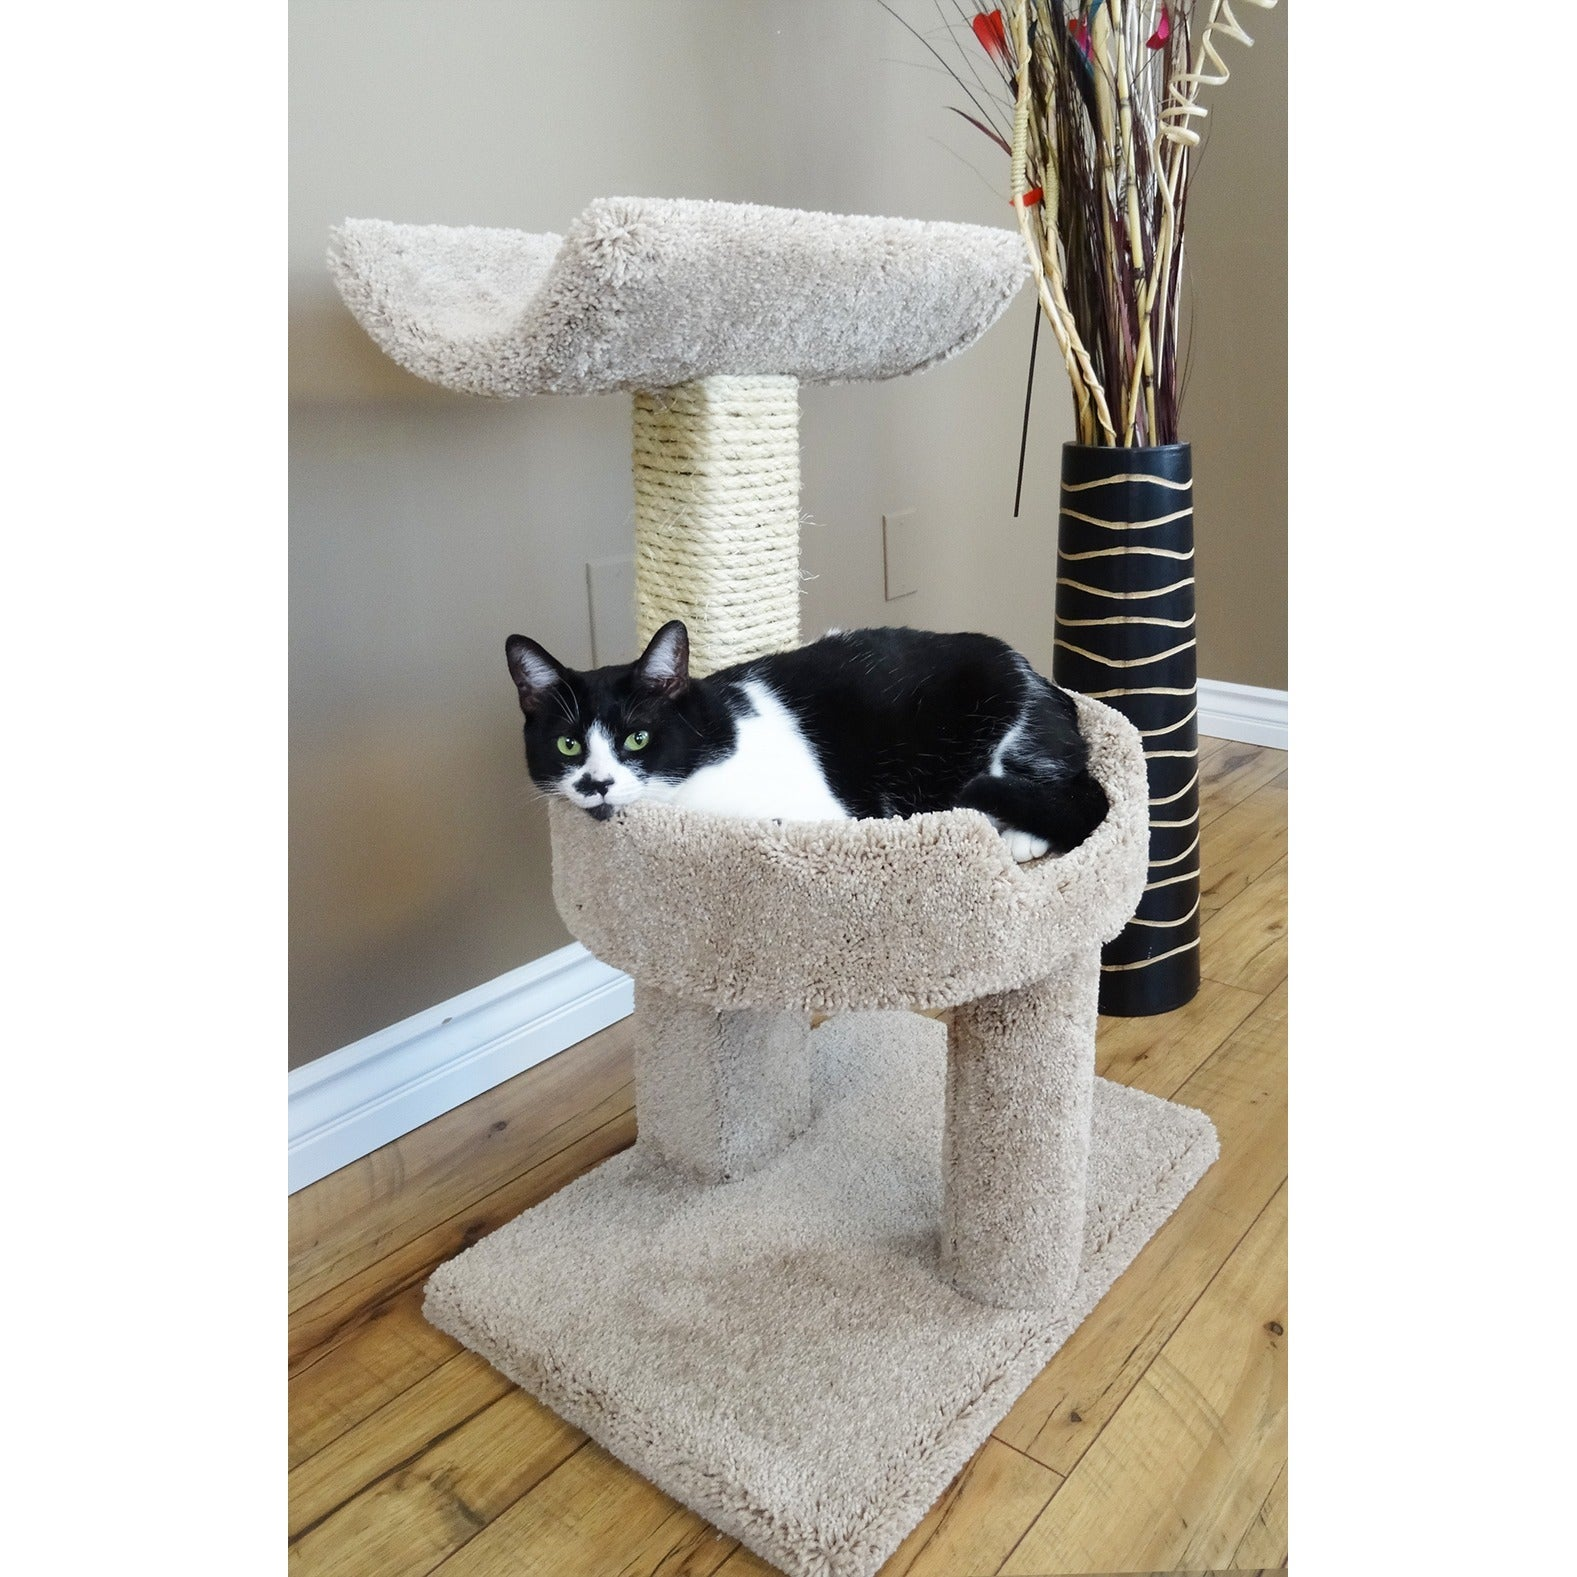 new cat condos window cat perch  free shipping today  overstock  - new cat condos window cat perch  free shipping today  overstockcom